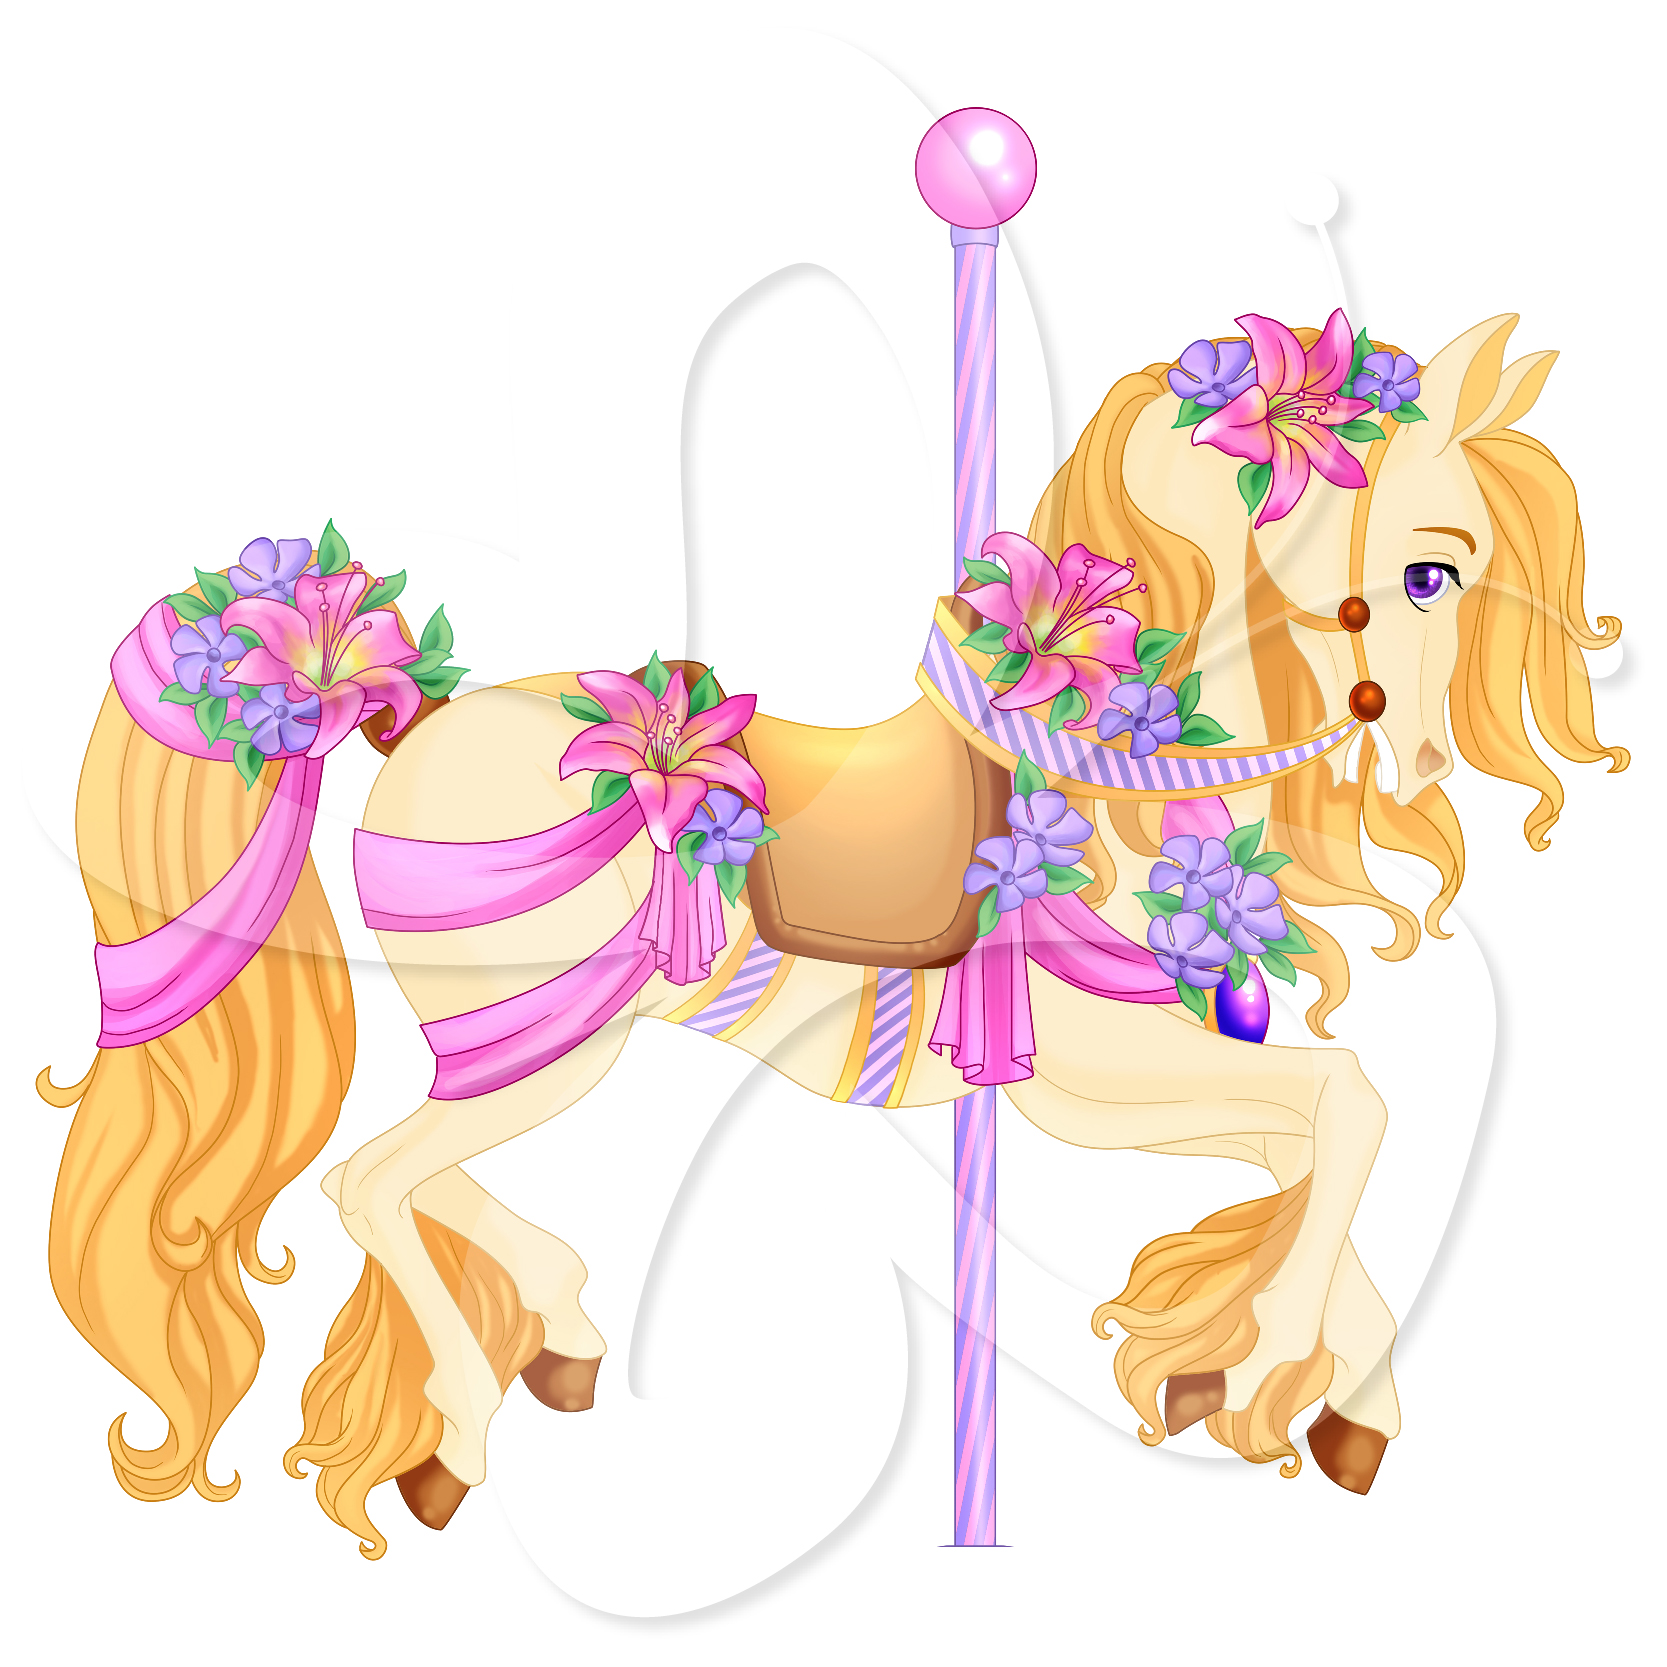 Carousel Horse Clipart-carousel horse clipart-3